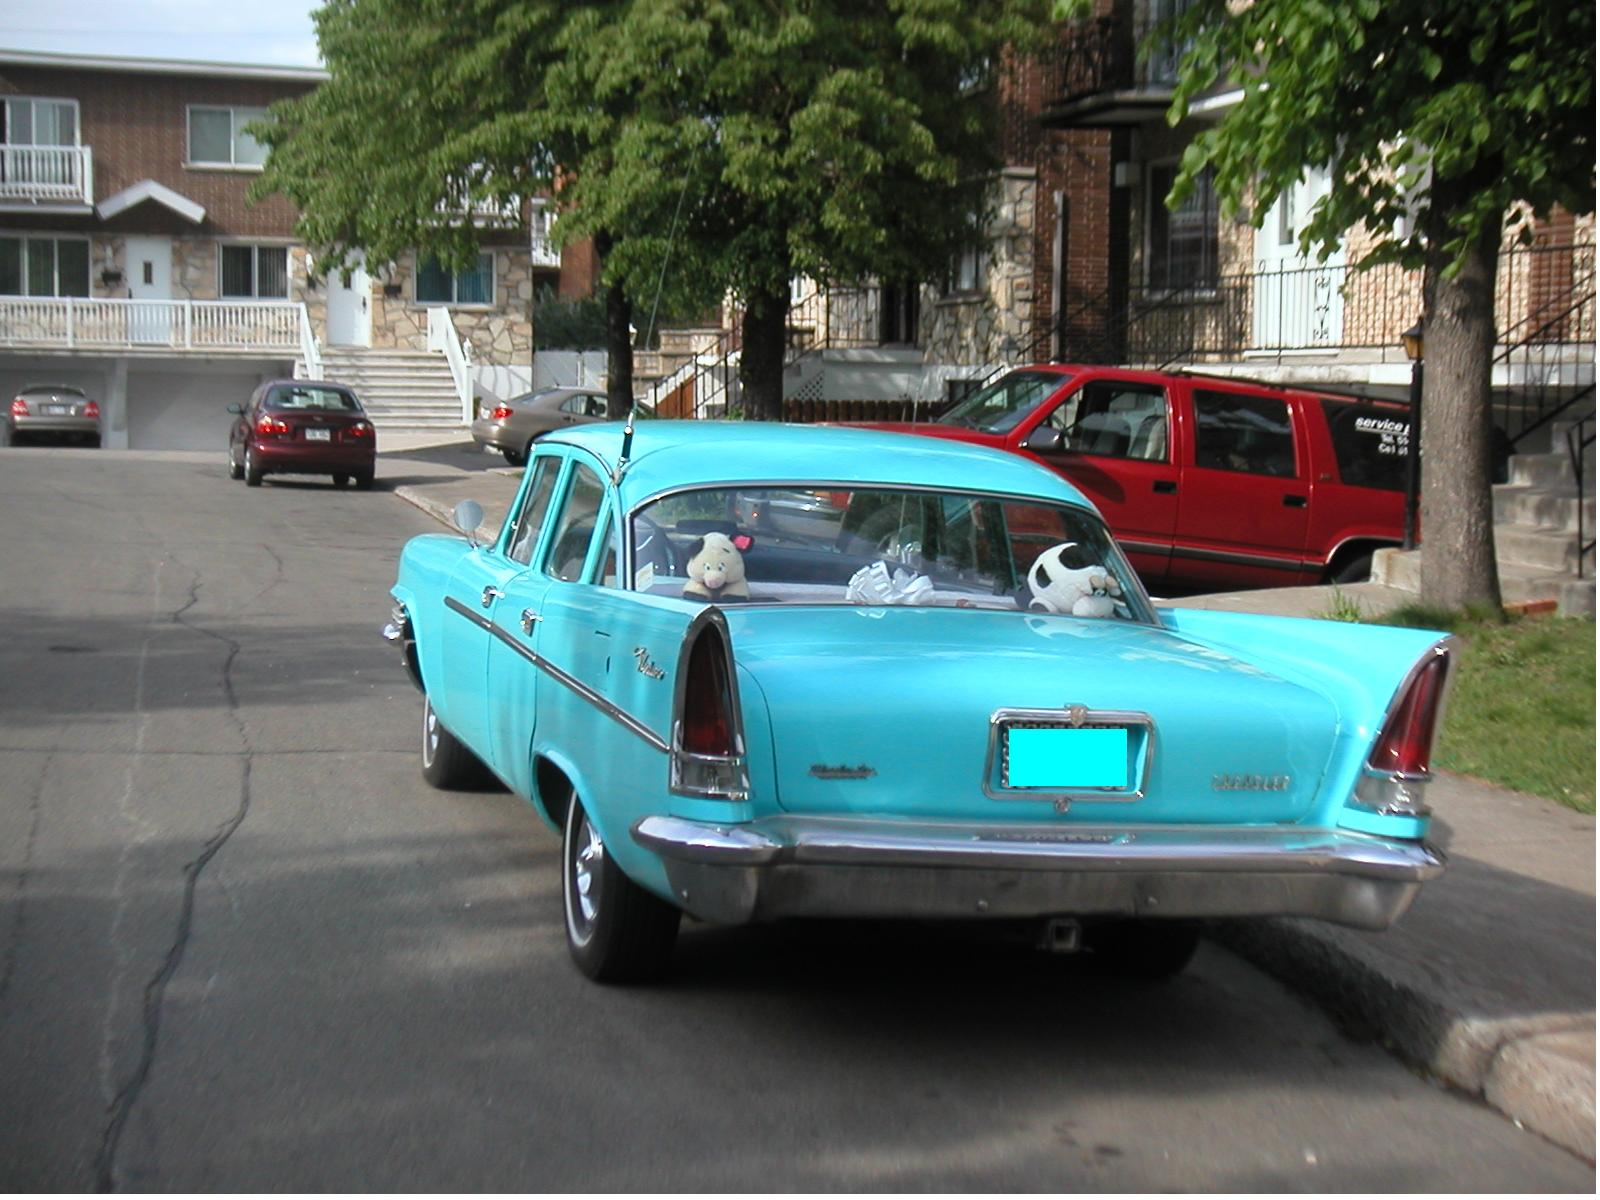 1957 Chrysler Saratoga picture, exterior